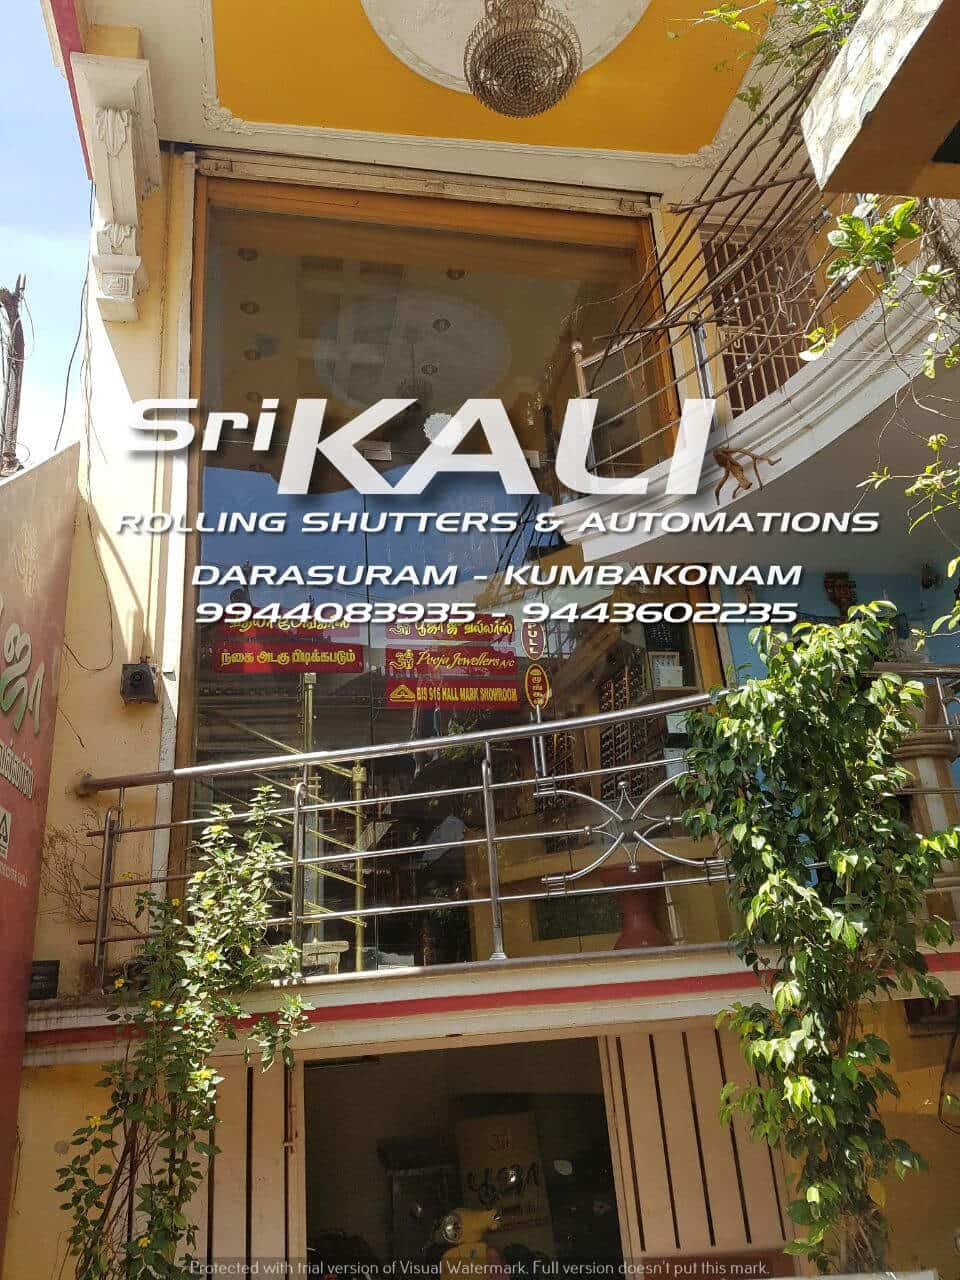 Sri Kali Rolling Shutters Automations Photos, Darasuram